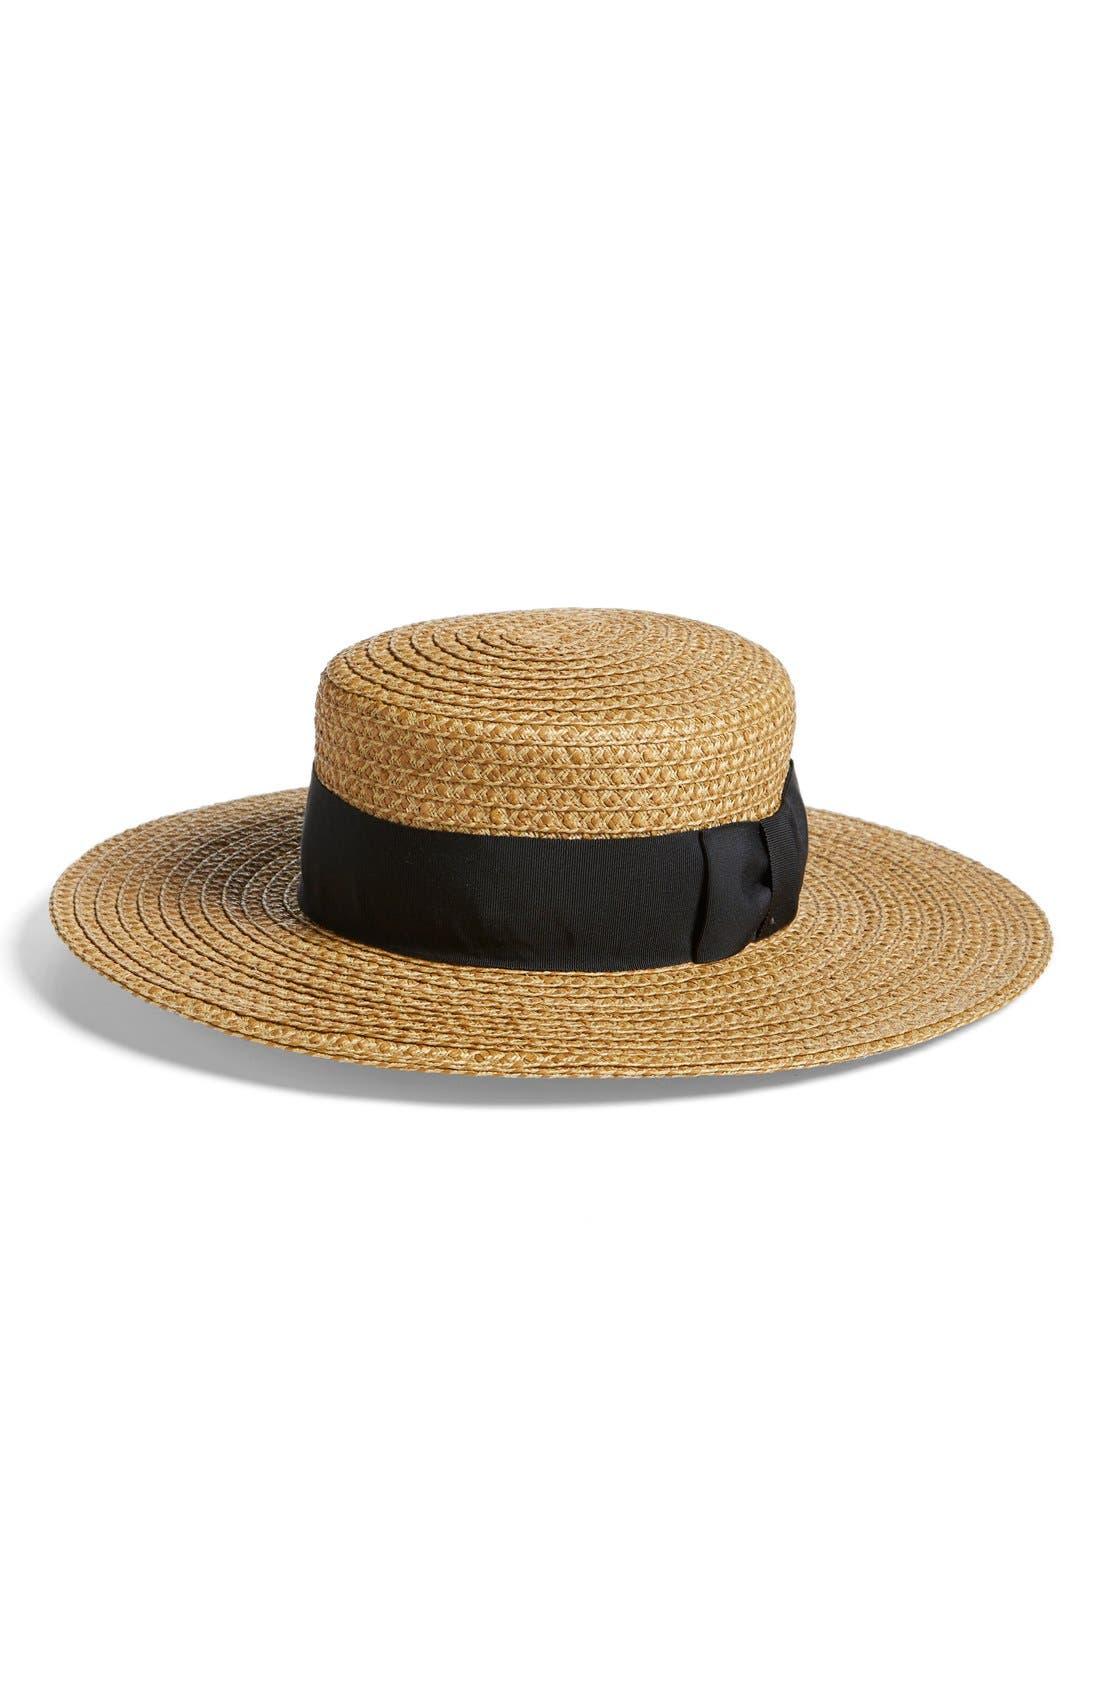 Alternate Image 1 Selected - Eric Javits 'Gondolier' Boater Hat